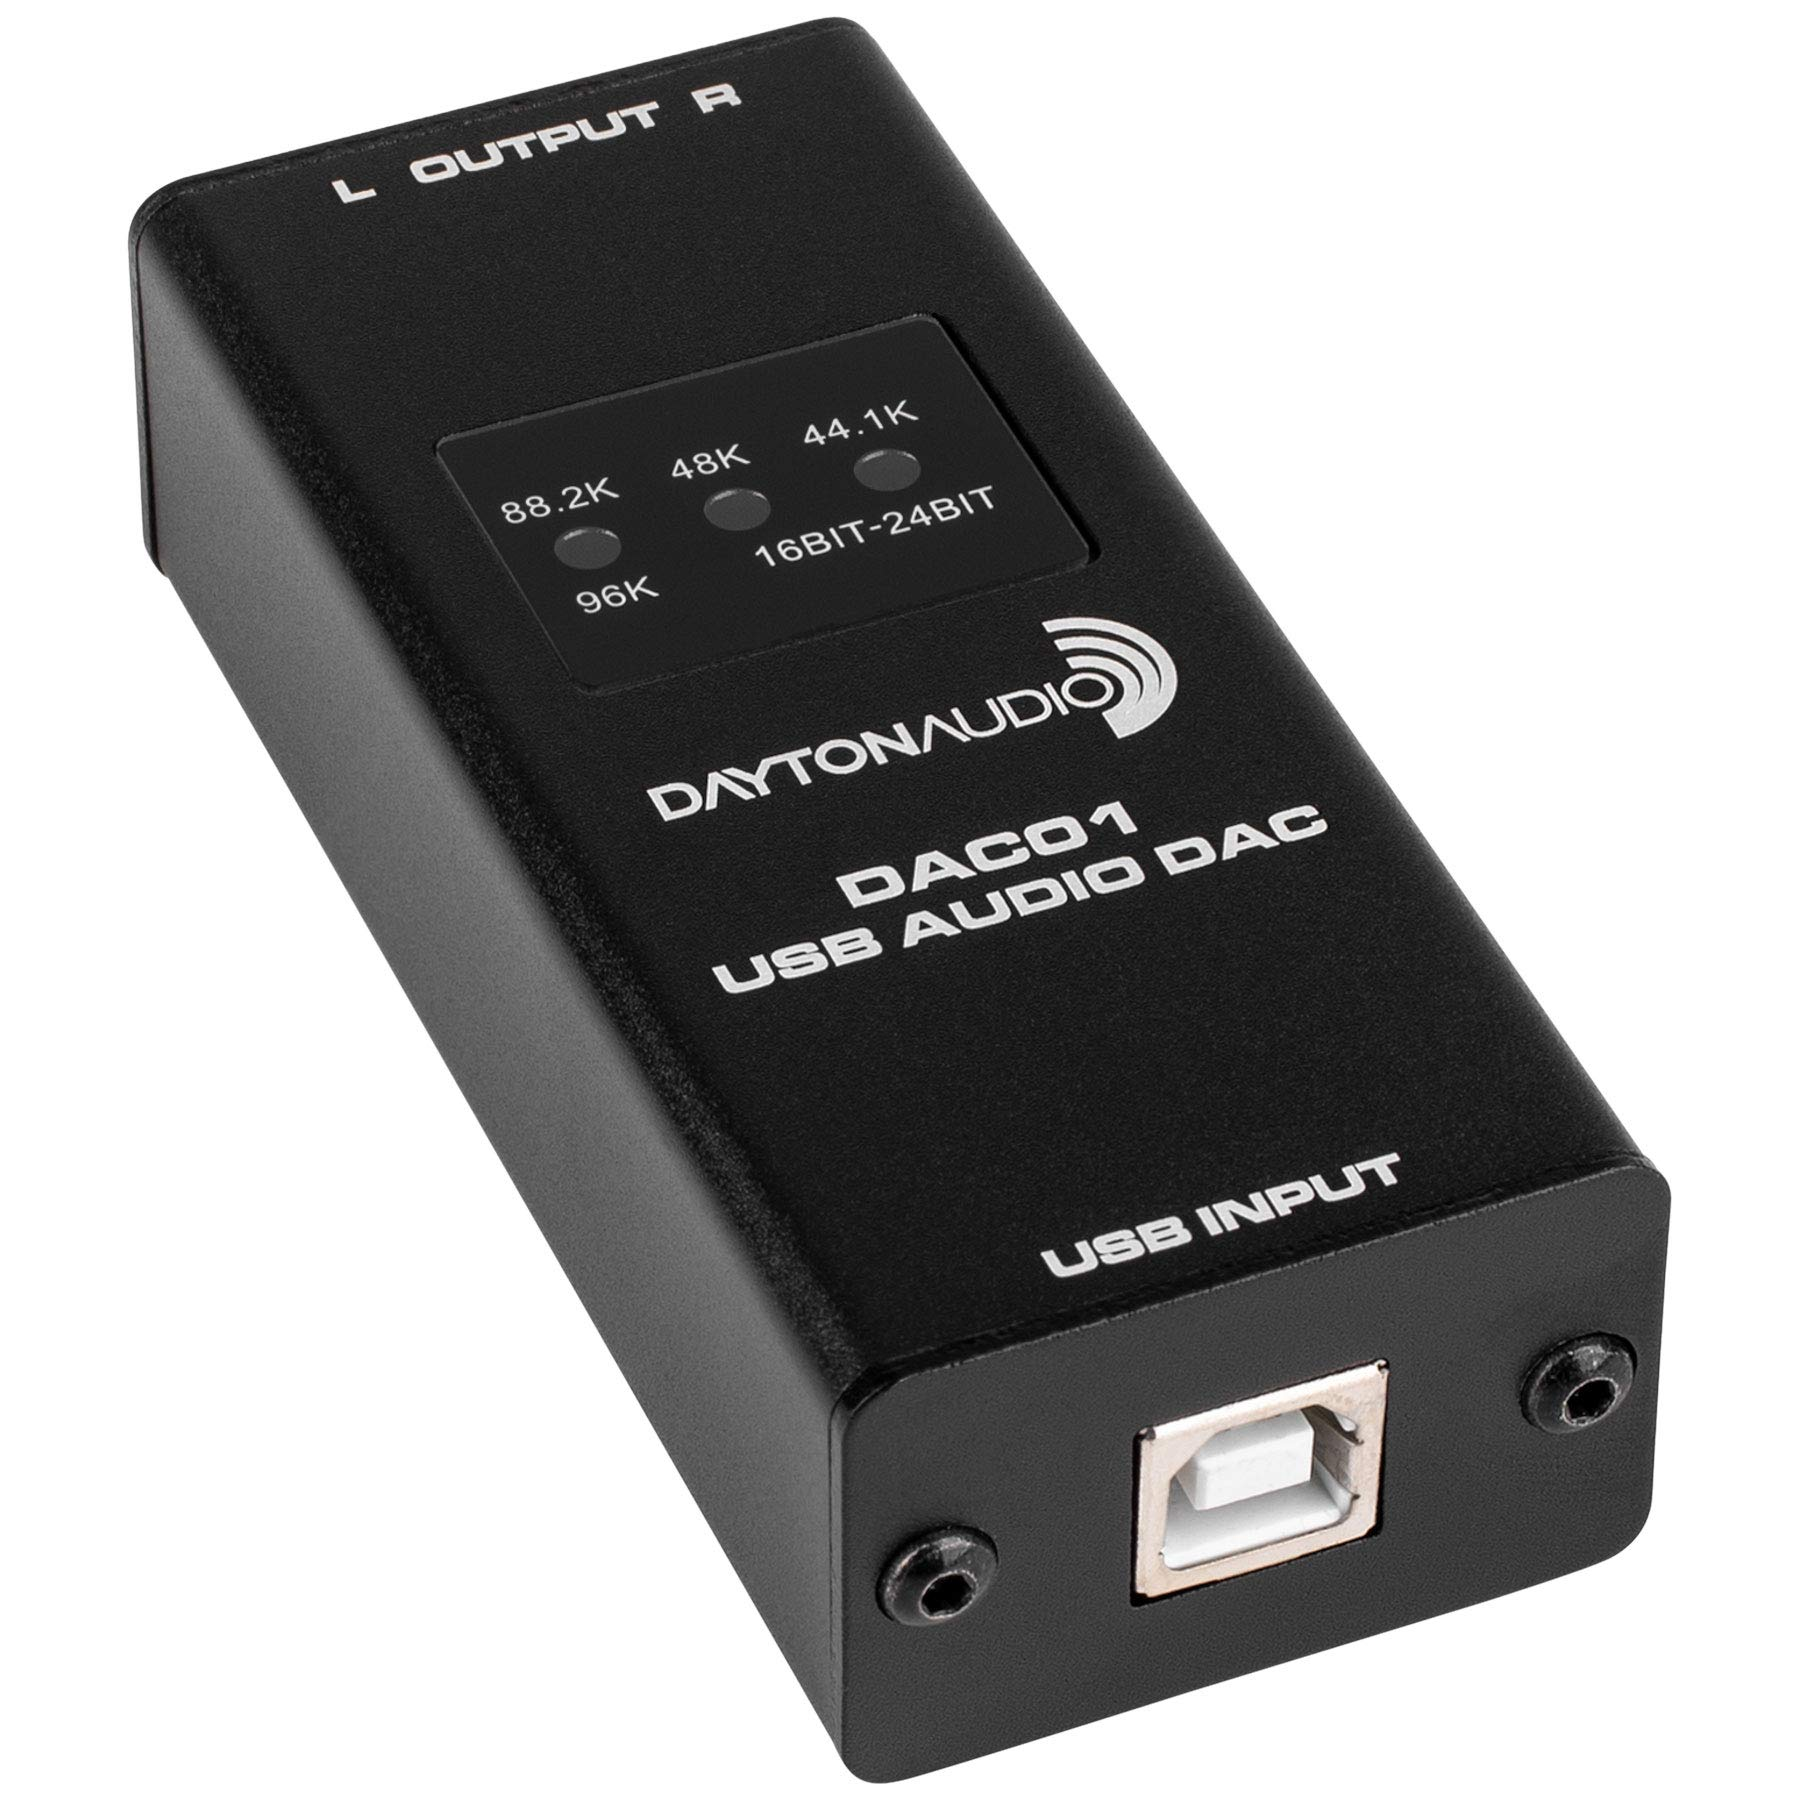 Dayton Audio DAC01 USB Audio DAC 24-bit/96 kHz RCA Output by Dayton Audio